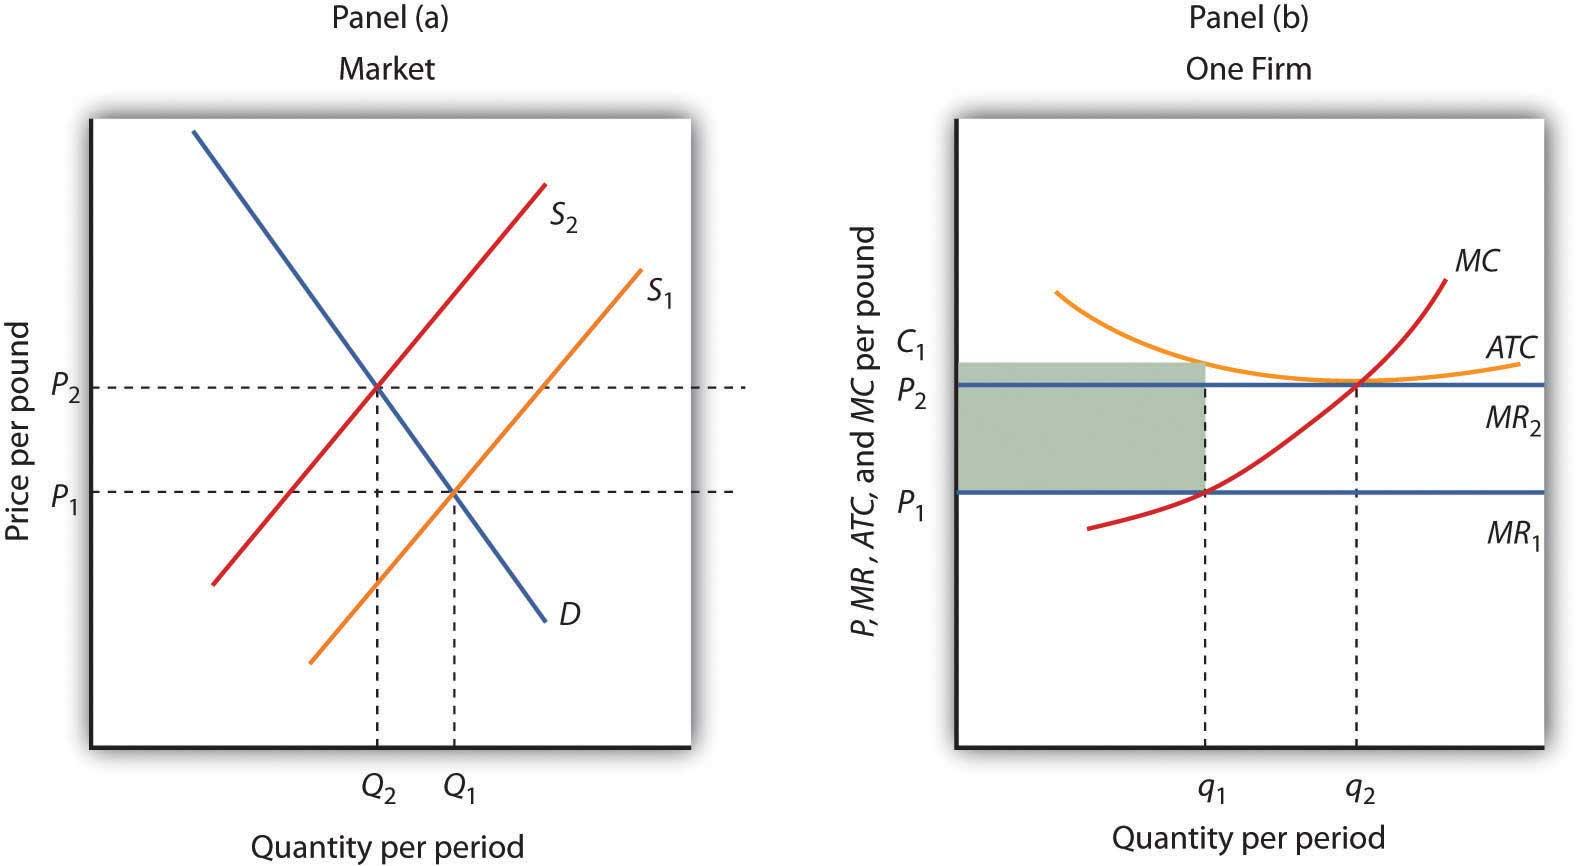 ECON101: Unit 6 Study Guide: Market Structure: Competitive and Non